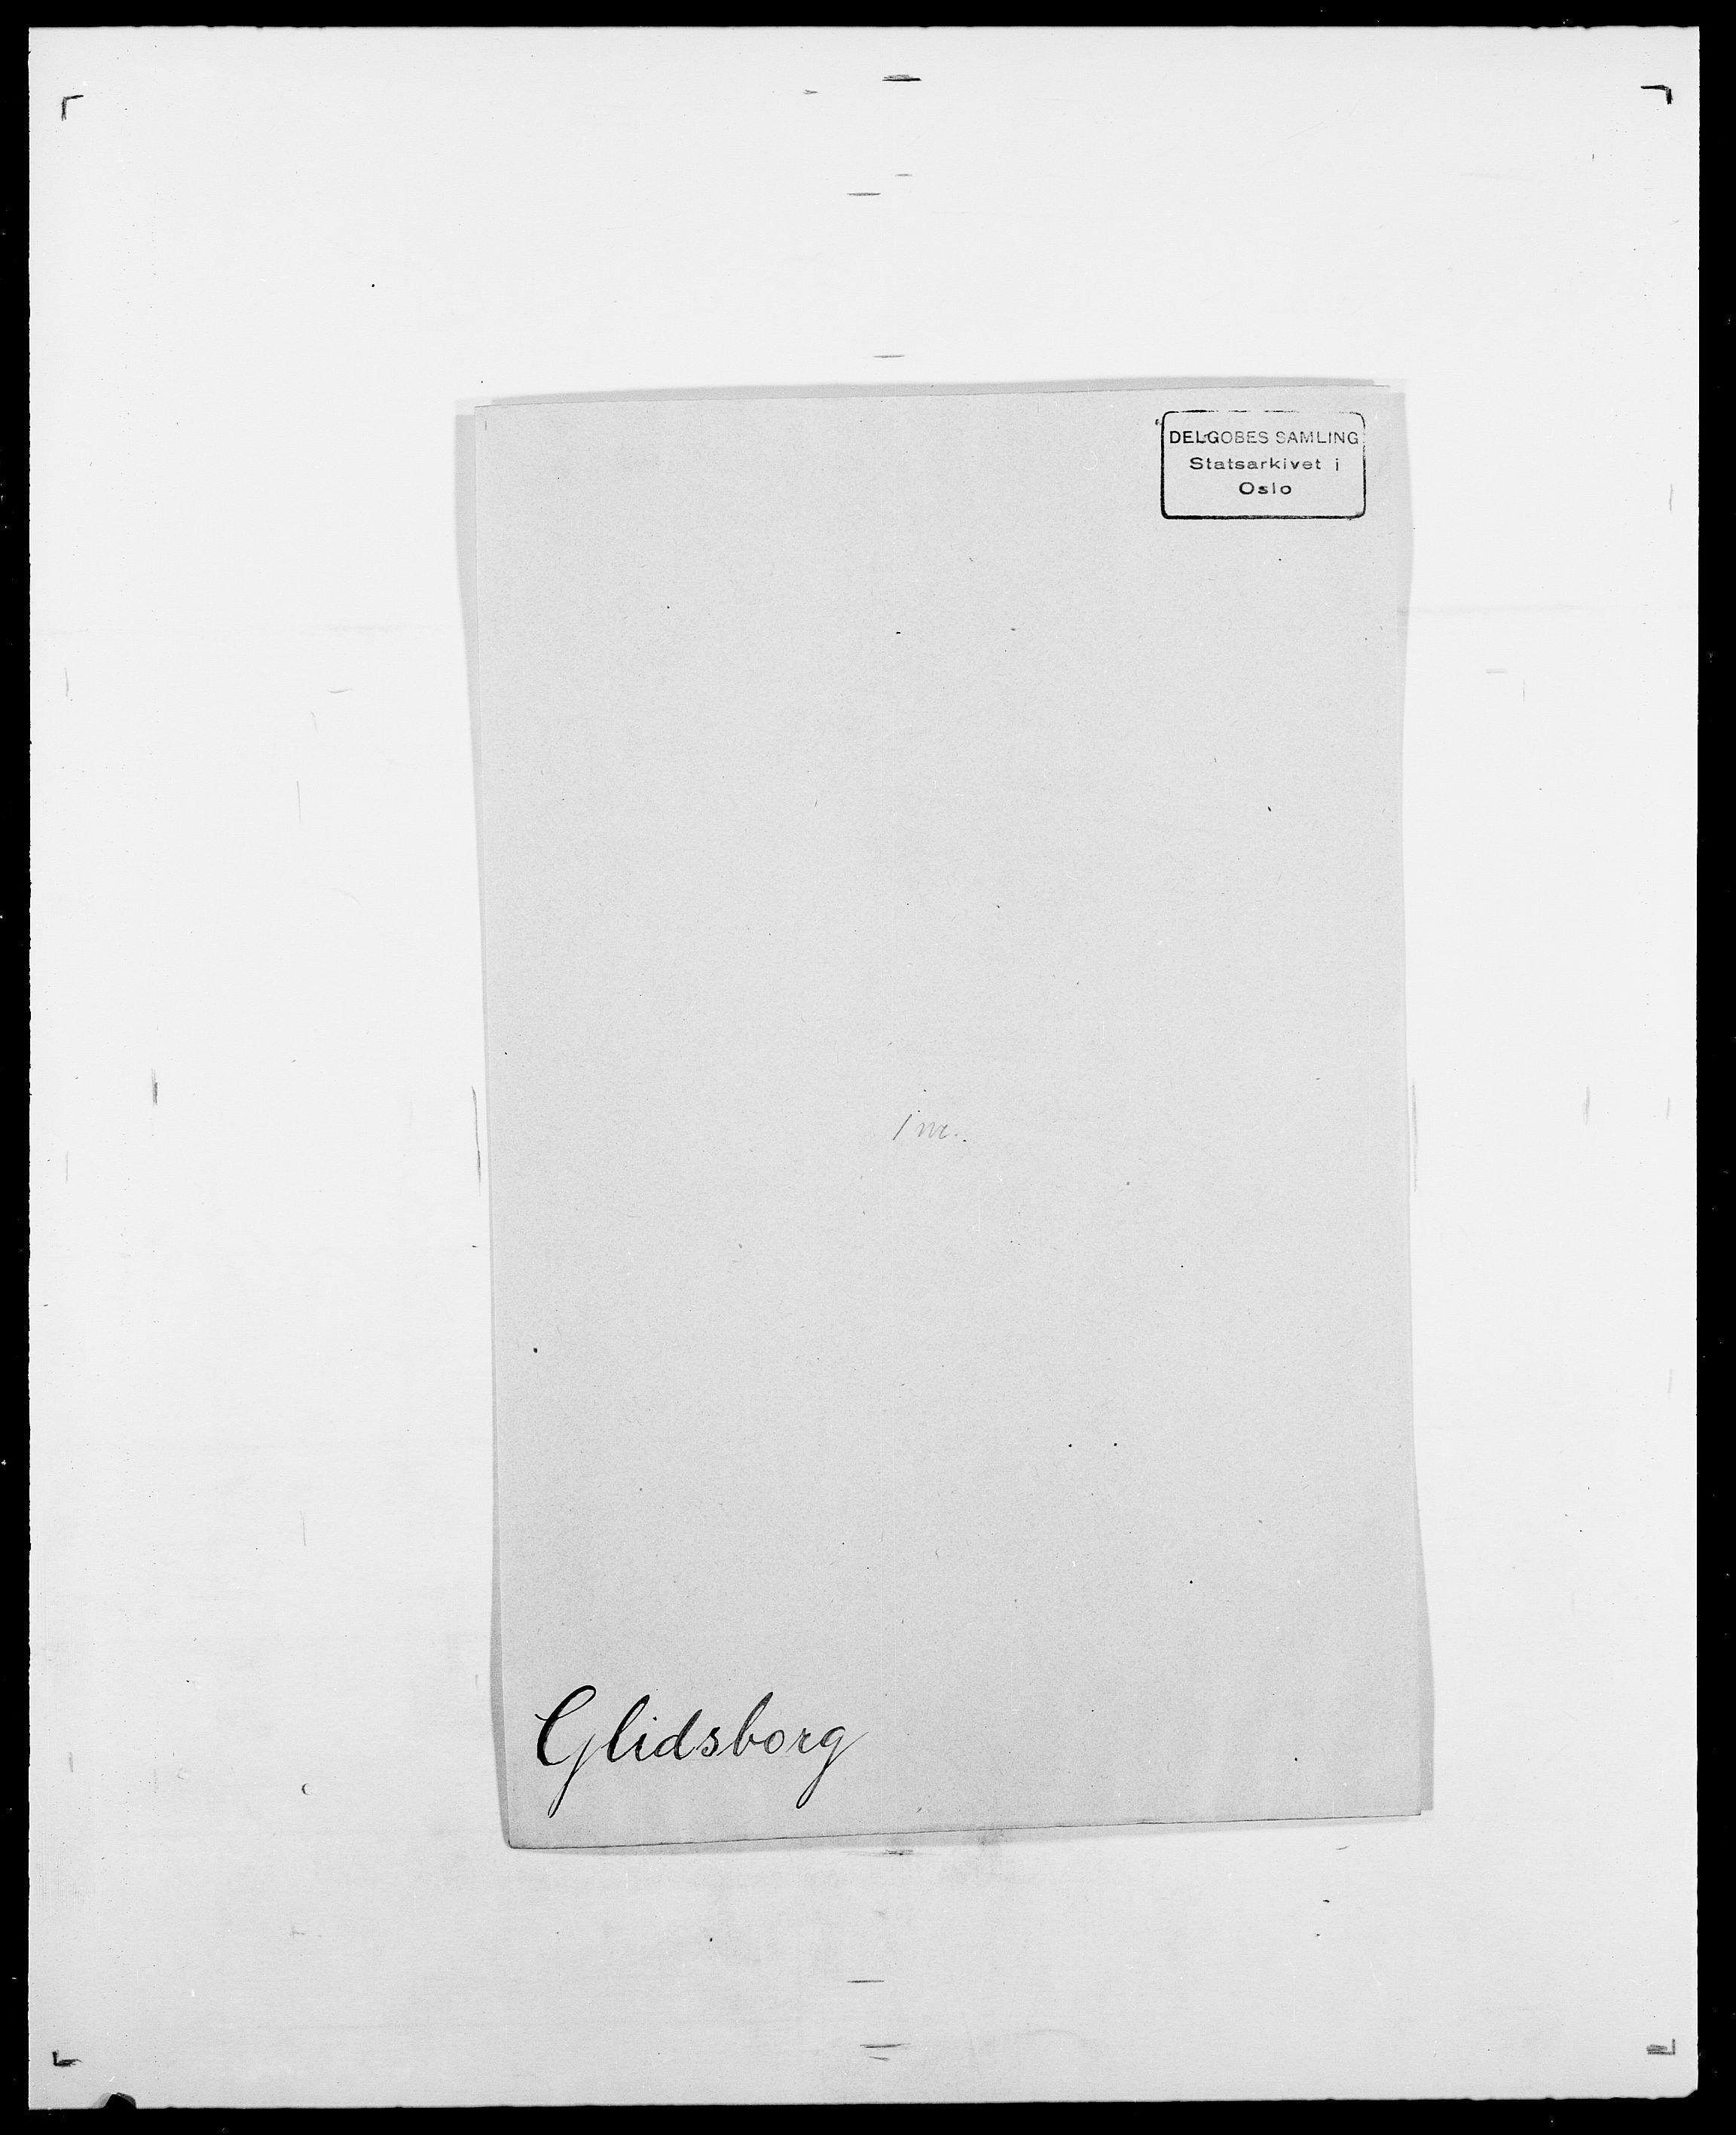 SAO, Delgobe, Charles Antoine - samling, D/Da/L0014: Giebdhausen - Grip, s. 316